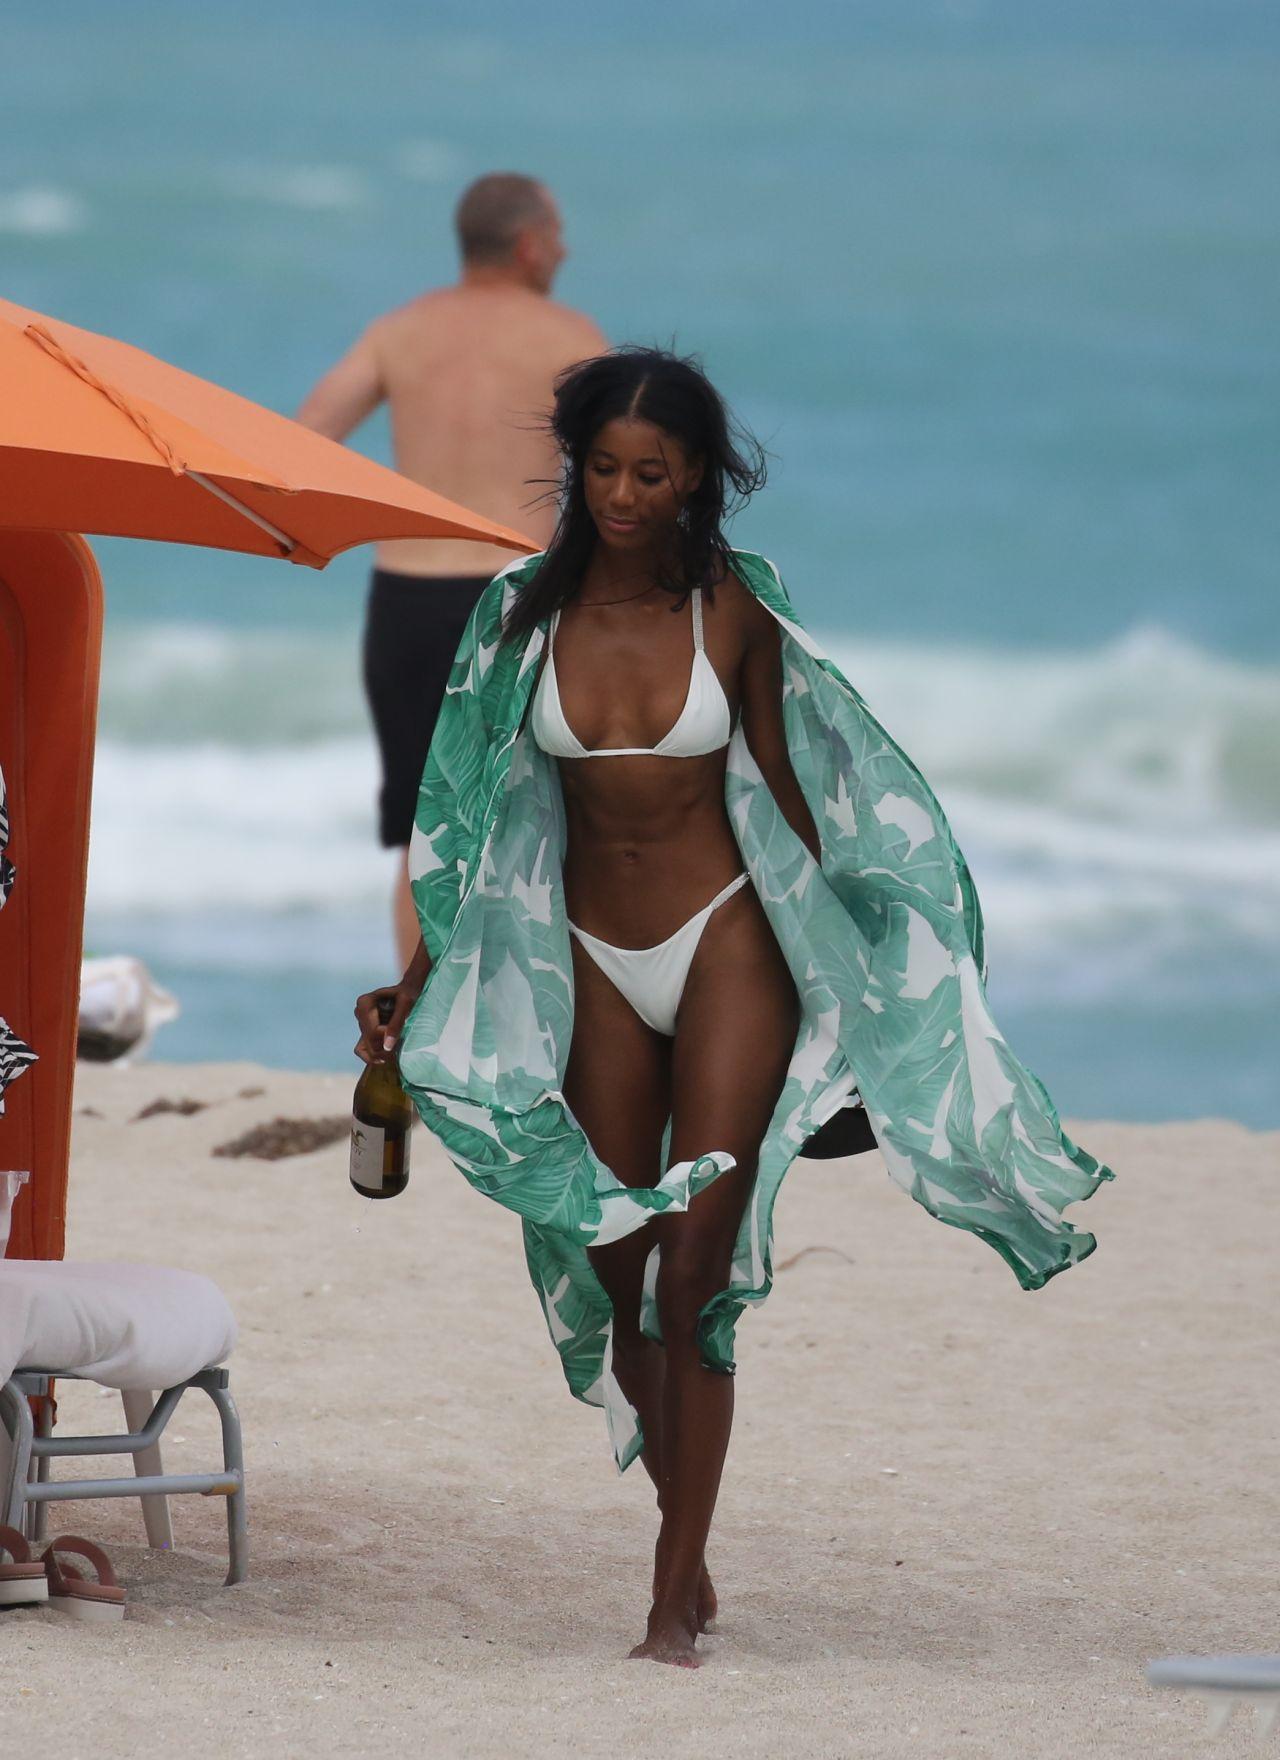 Jazzma Kendrick In A White Bikini At The Beach In Miami 06